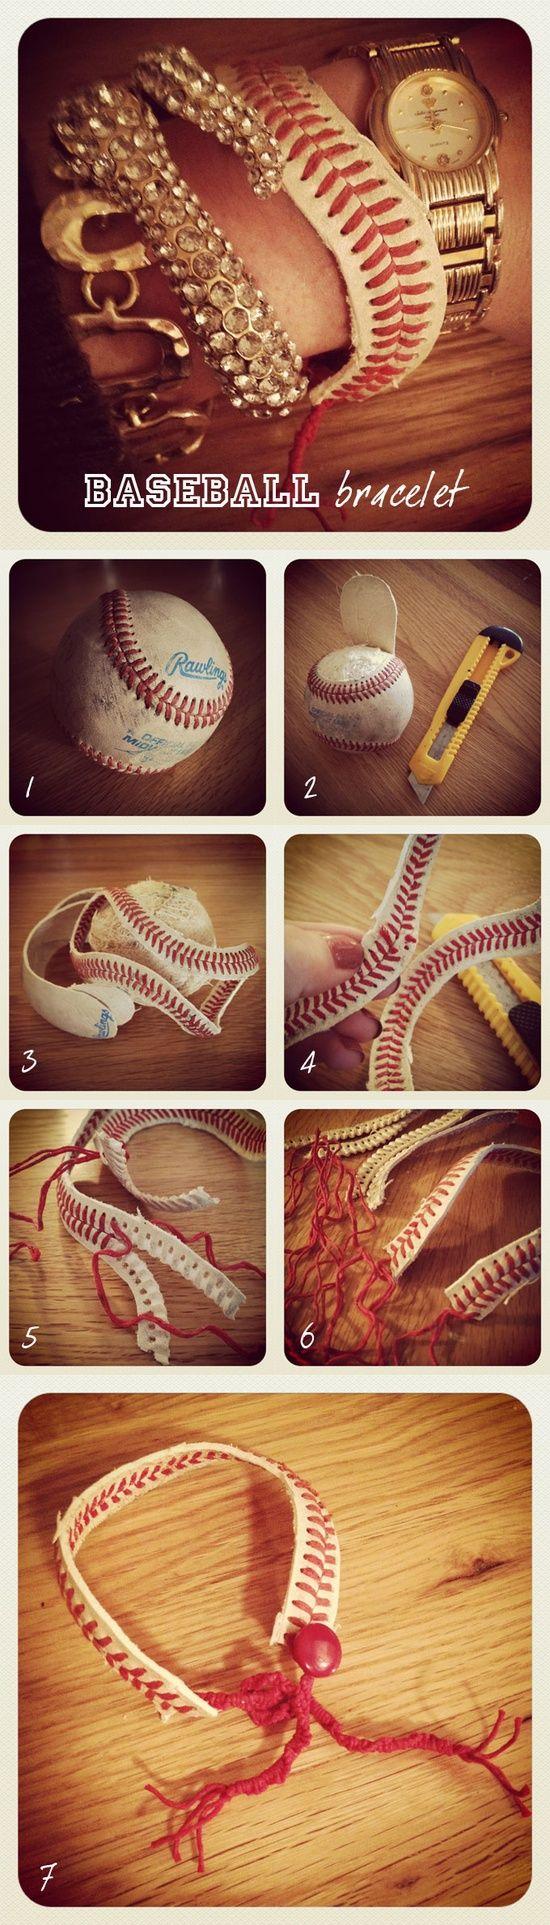 DIY Baseball Bracelet | iCreativeIdeas.com Like Us on Facebook ==> https://www.facebook.com/icreativeideas